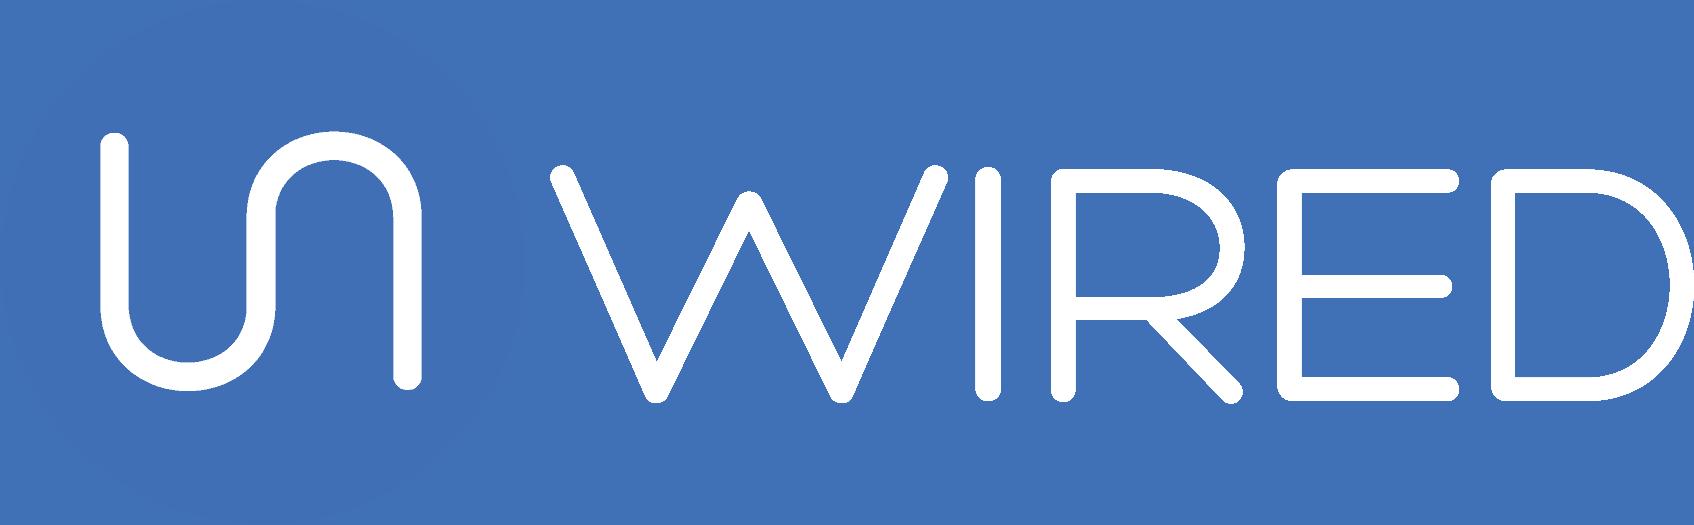 Provider Unwired